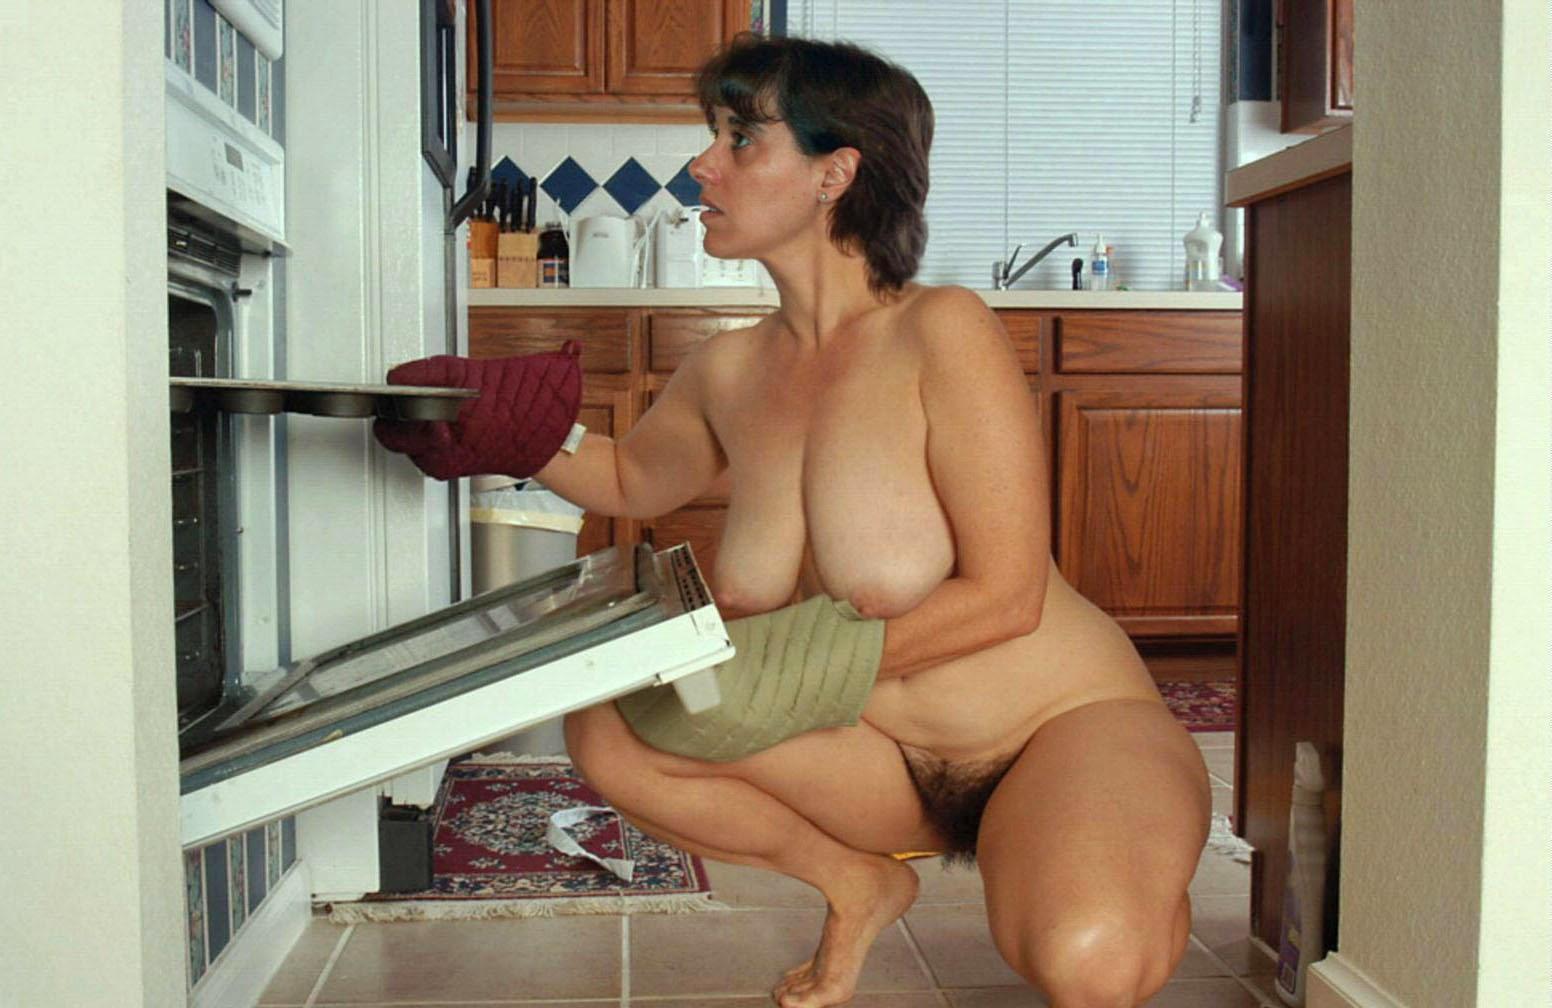 Голая пожилая женщина на кухне #14